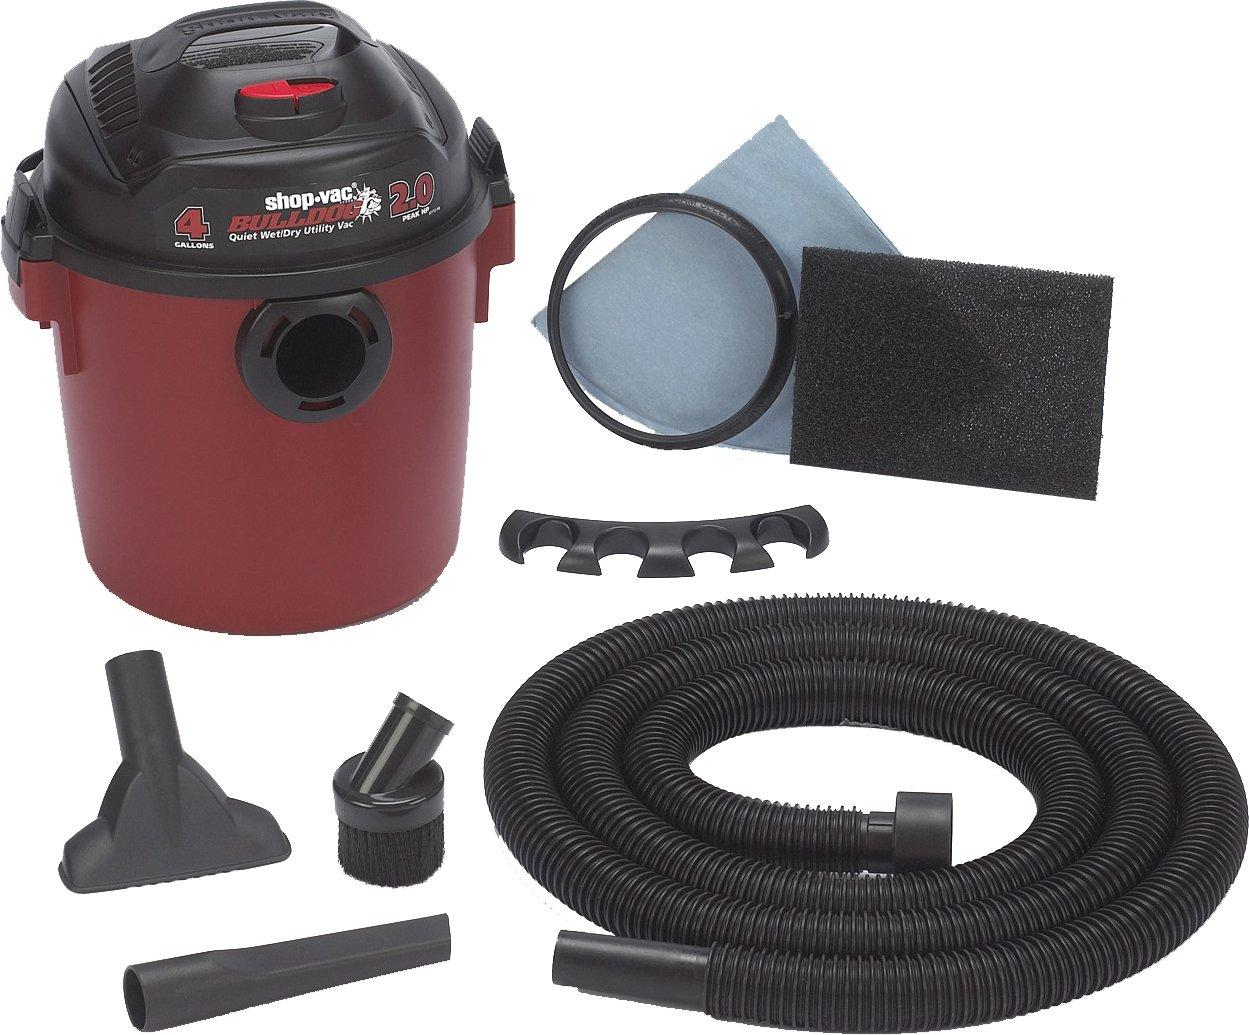 Shop-Vac 58503 Bulldog 2 HP Wet/Dry Vacuum - 4 Gallon Capacity by Shop-Vac (Image #1)